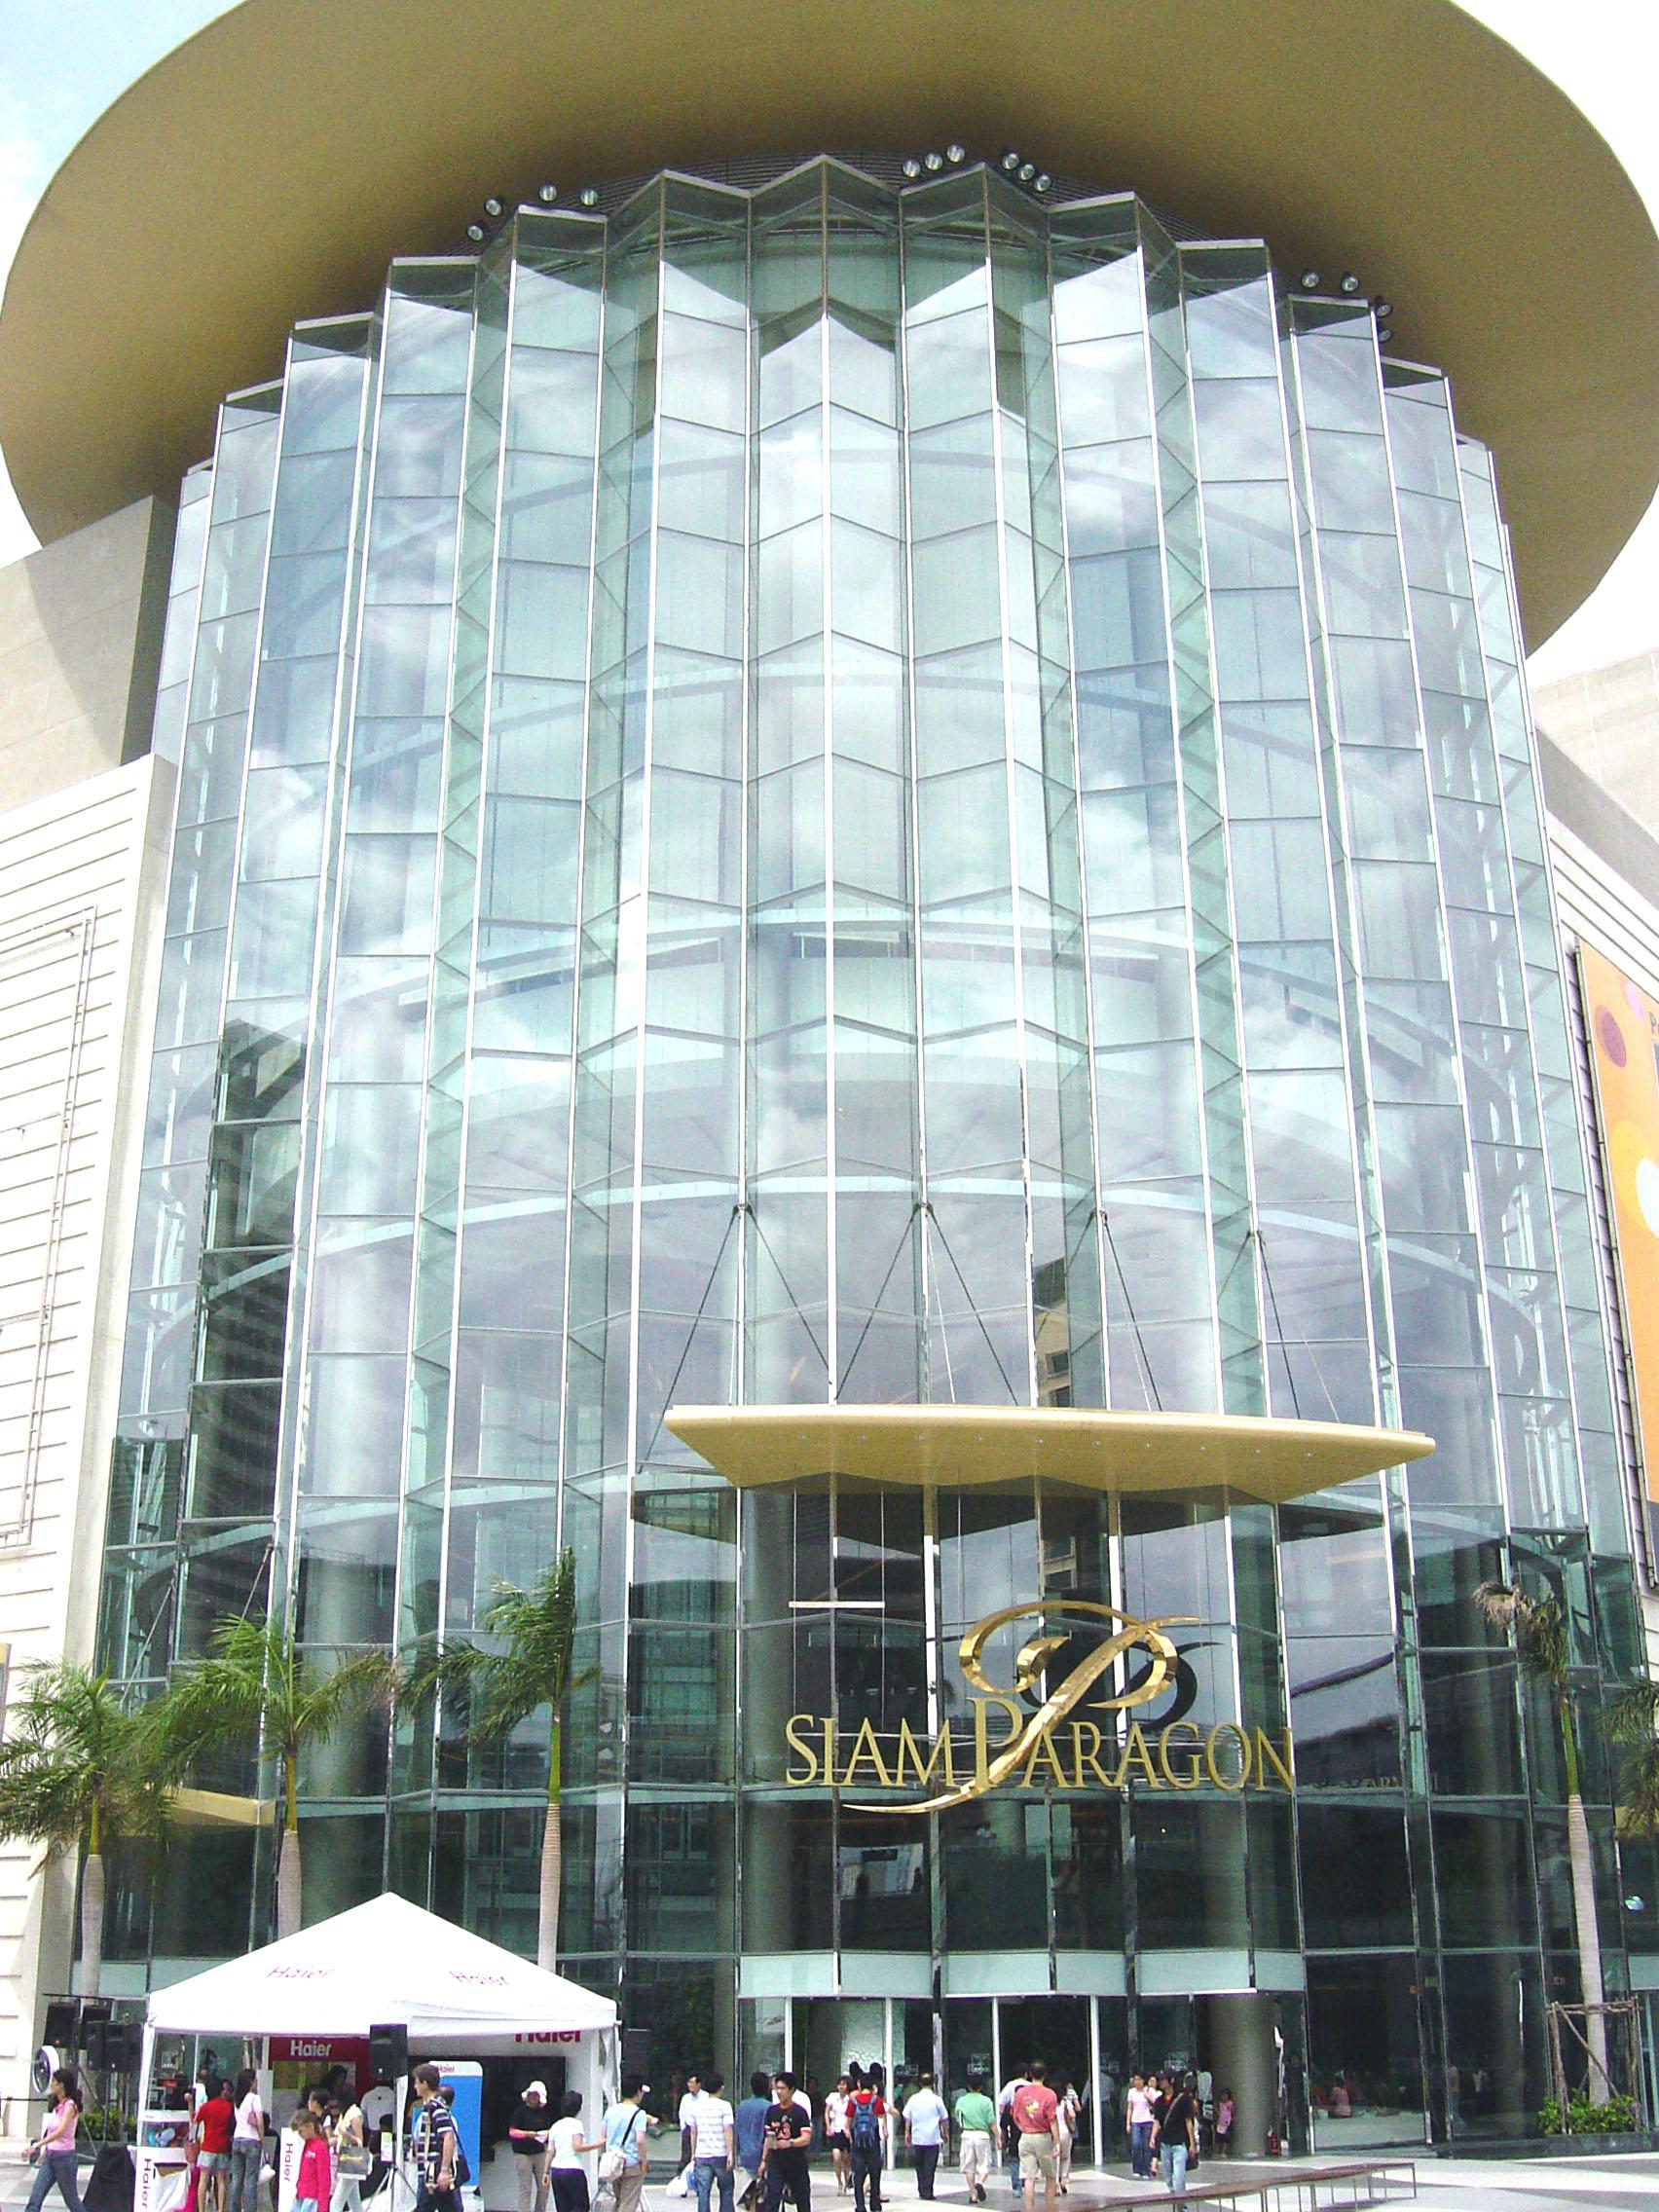 File:Siam Paragon Bangkok 1.jpg - Wikimedia Commons